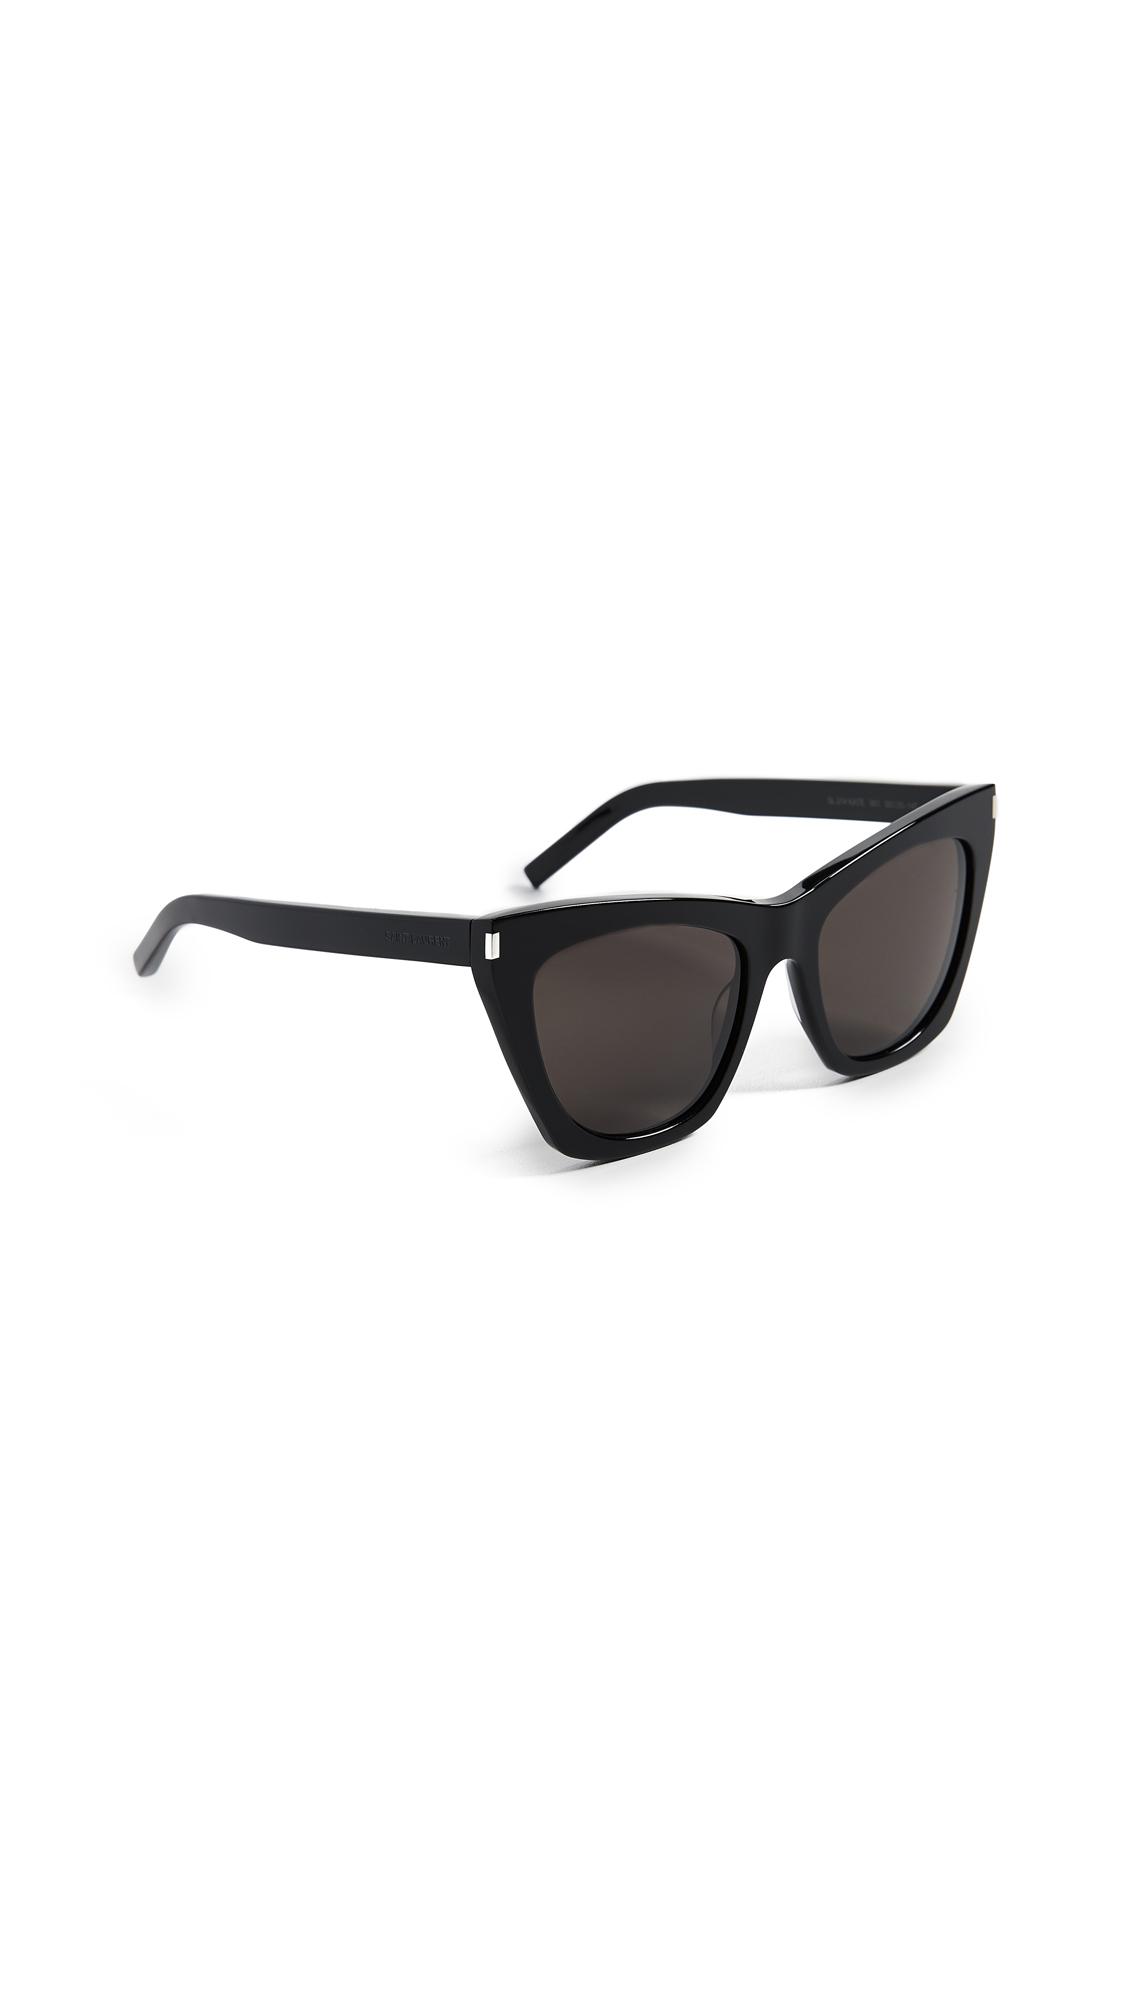 3e7b8842fbd Saint Laurent Kate Cat Eye Sunglasses In Black Solid Grey